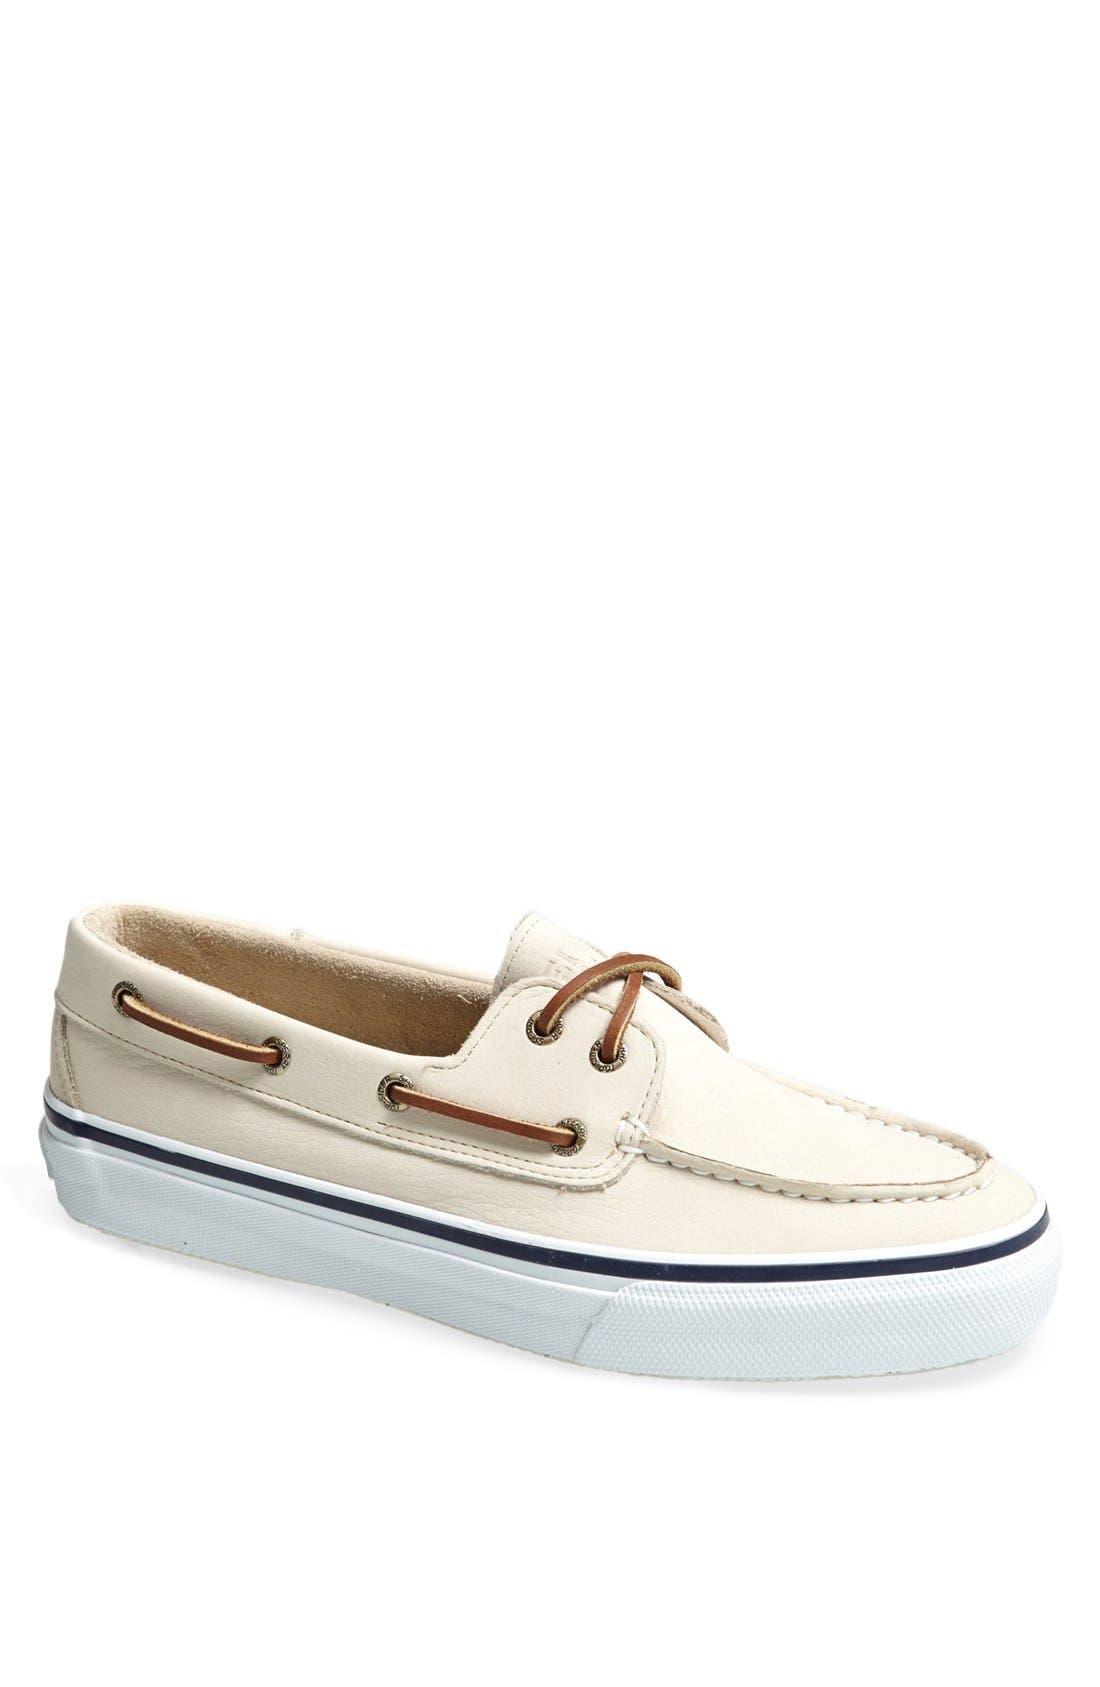 Main Image - Sperry Top-Sider® 'Bahama' Washable Boat Shoe